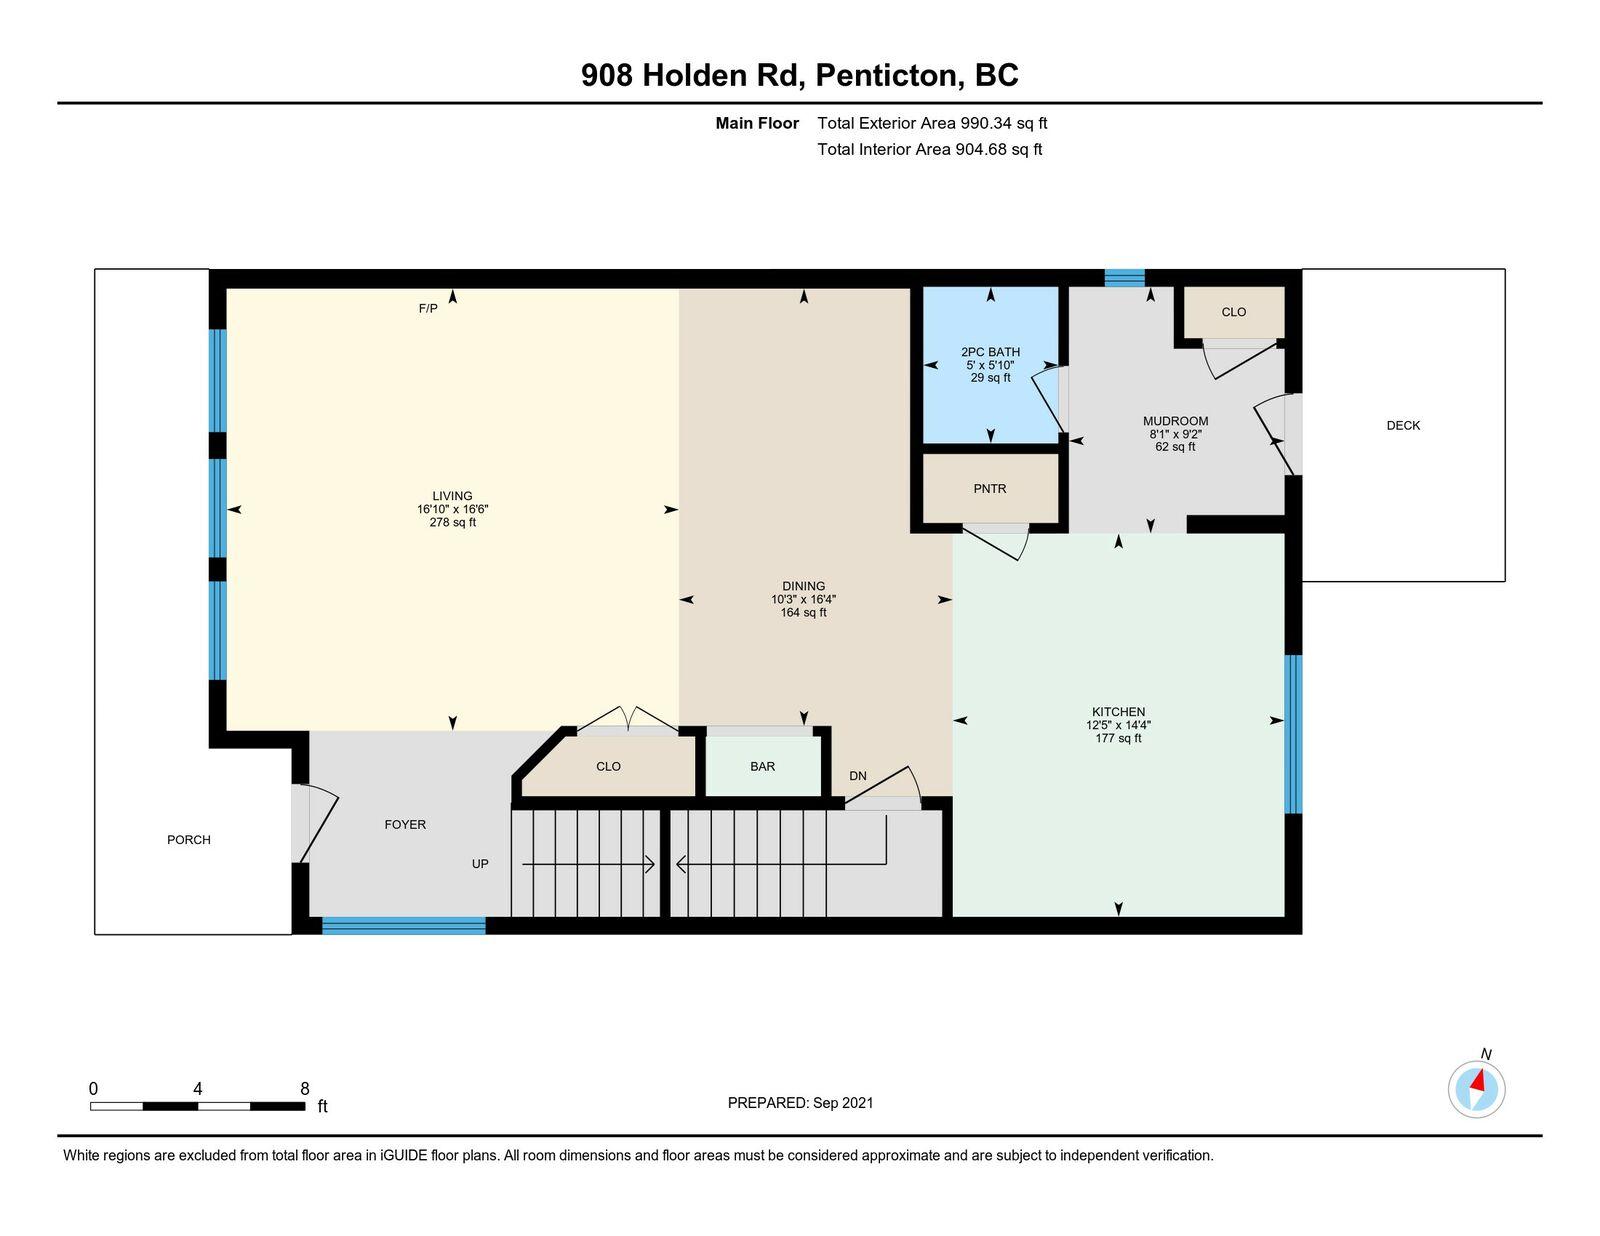 Floor Plan, Main